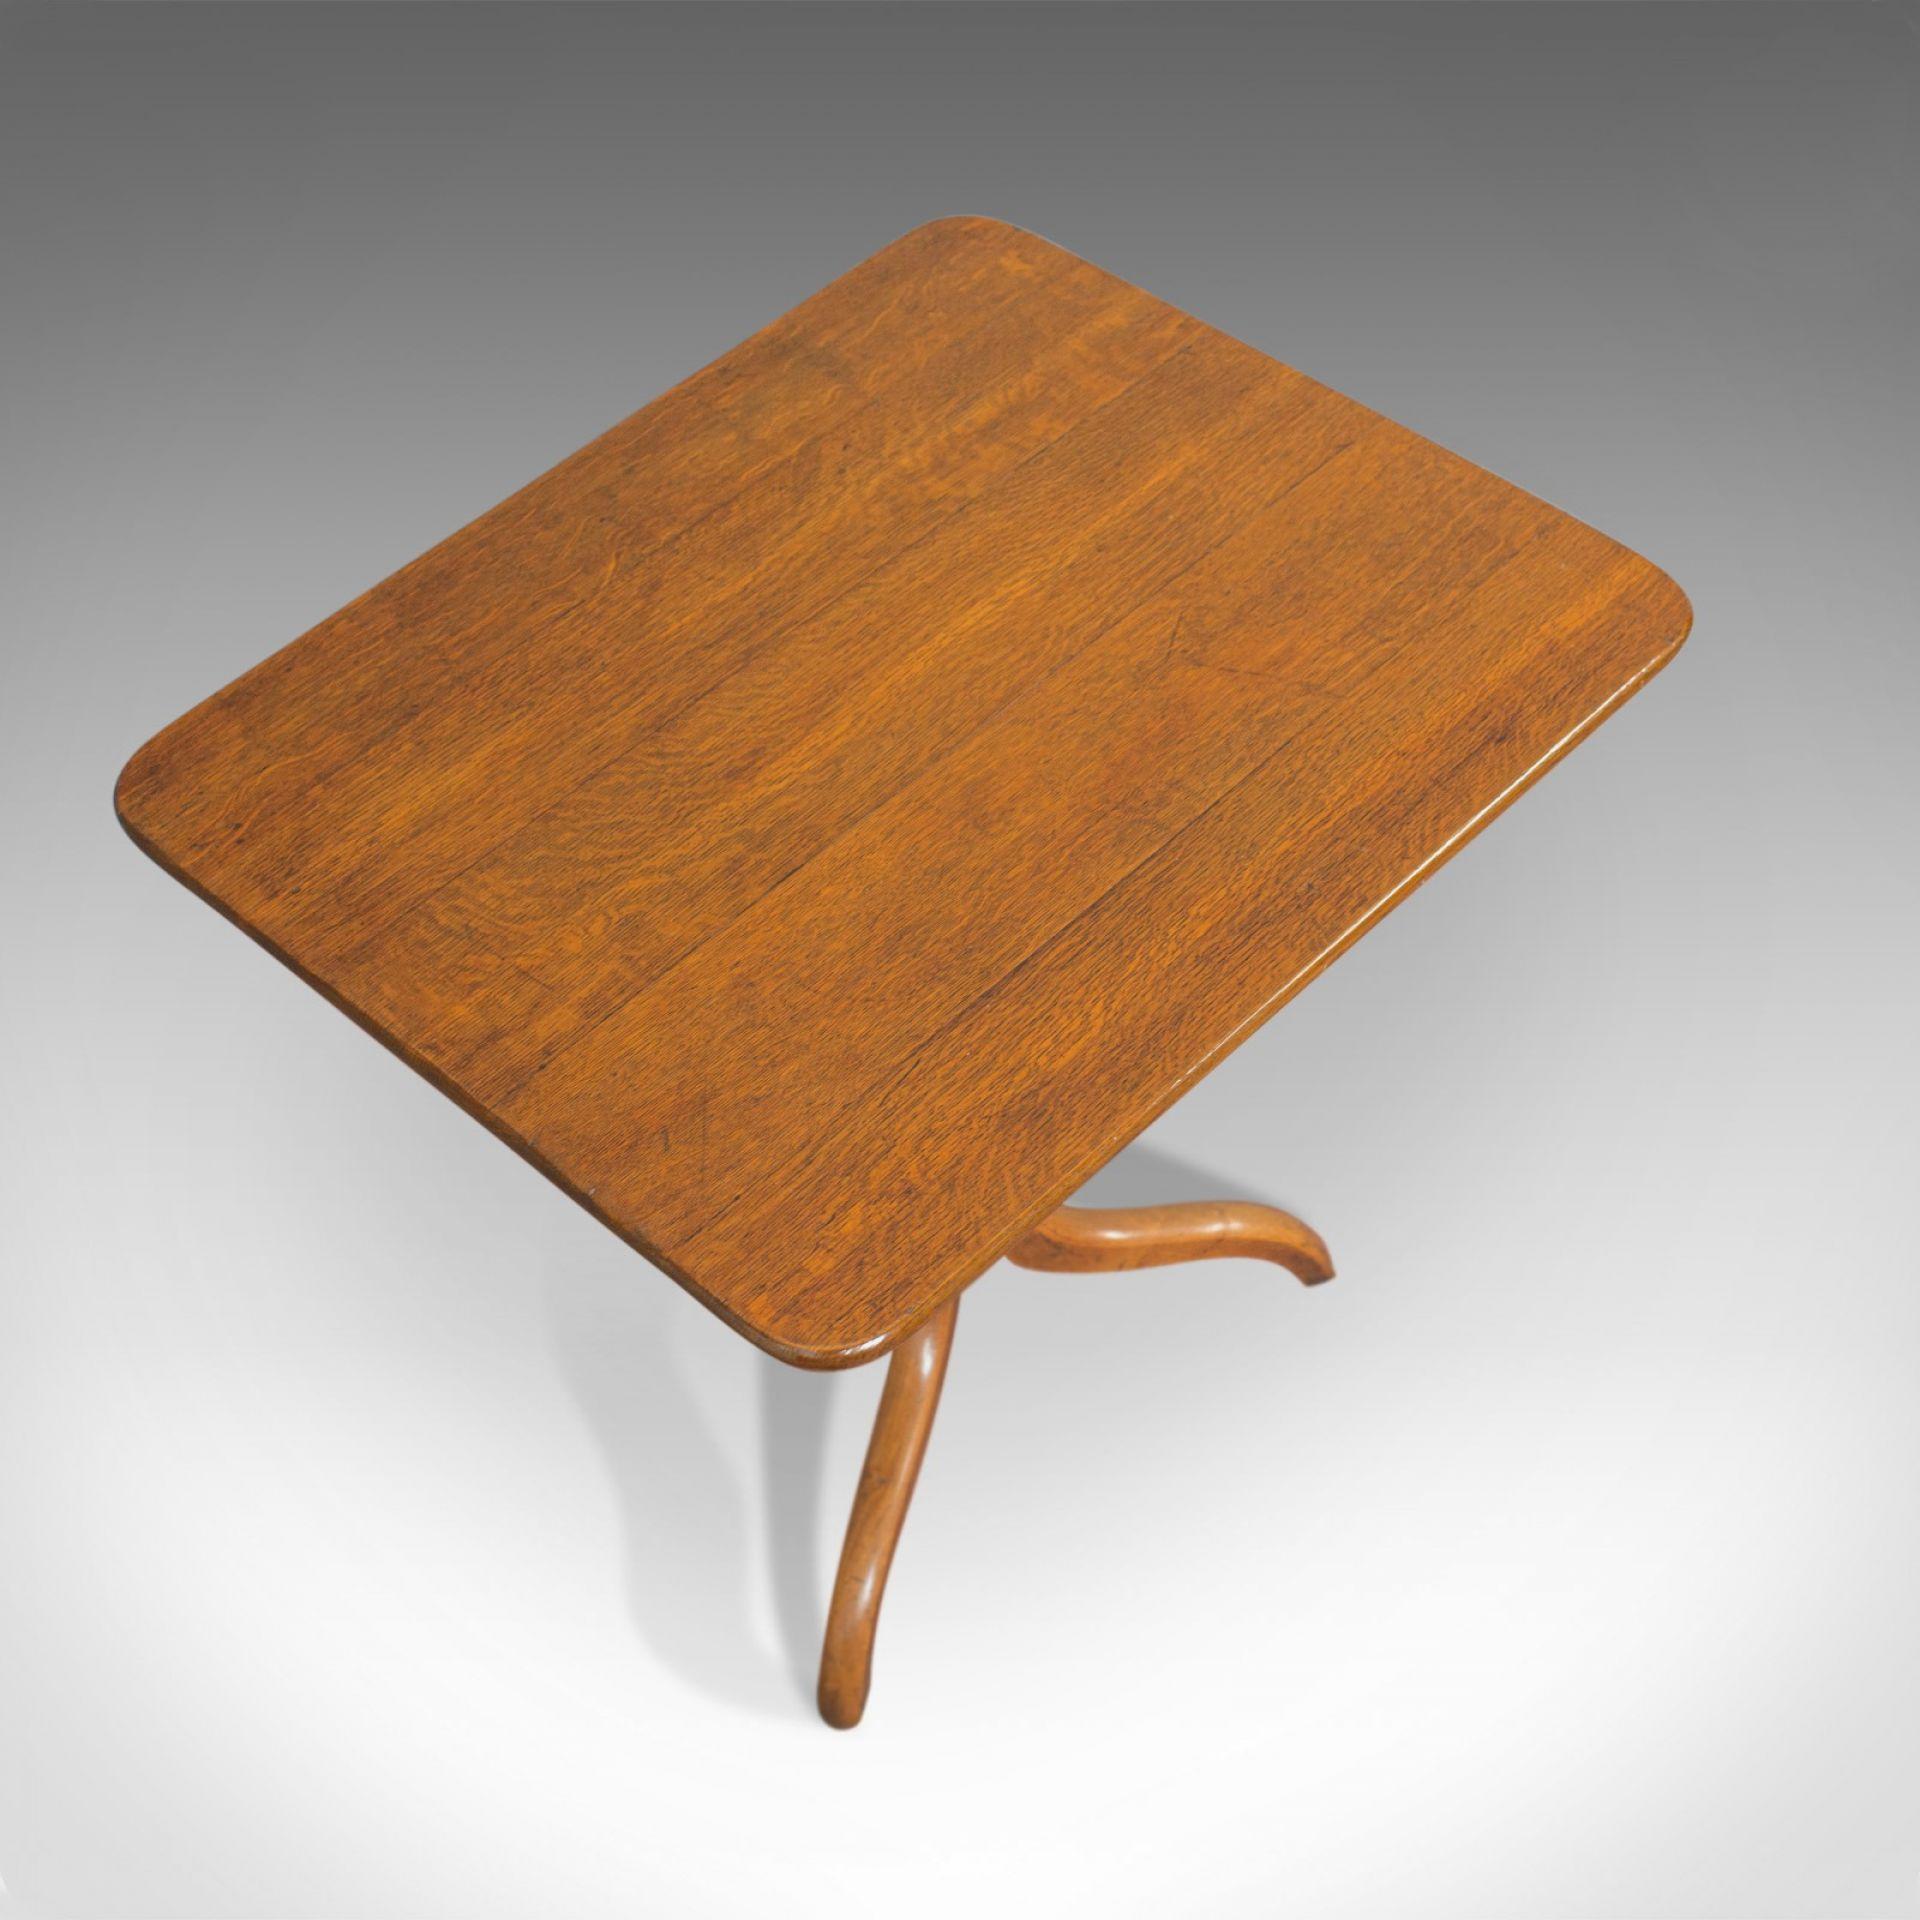 Antique Tripod Table, English, Regency, Tilt-Top, Oak, Side, Circa 1830